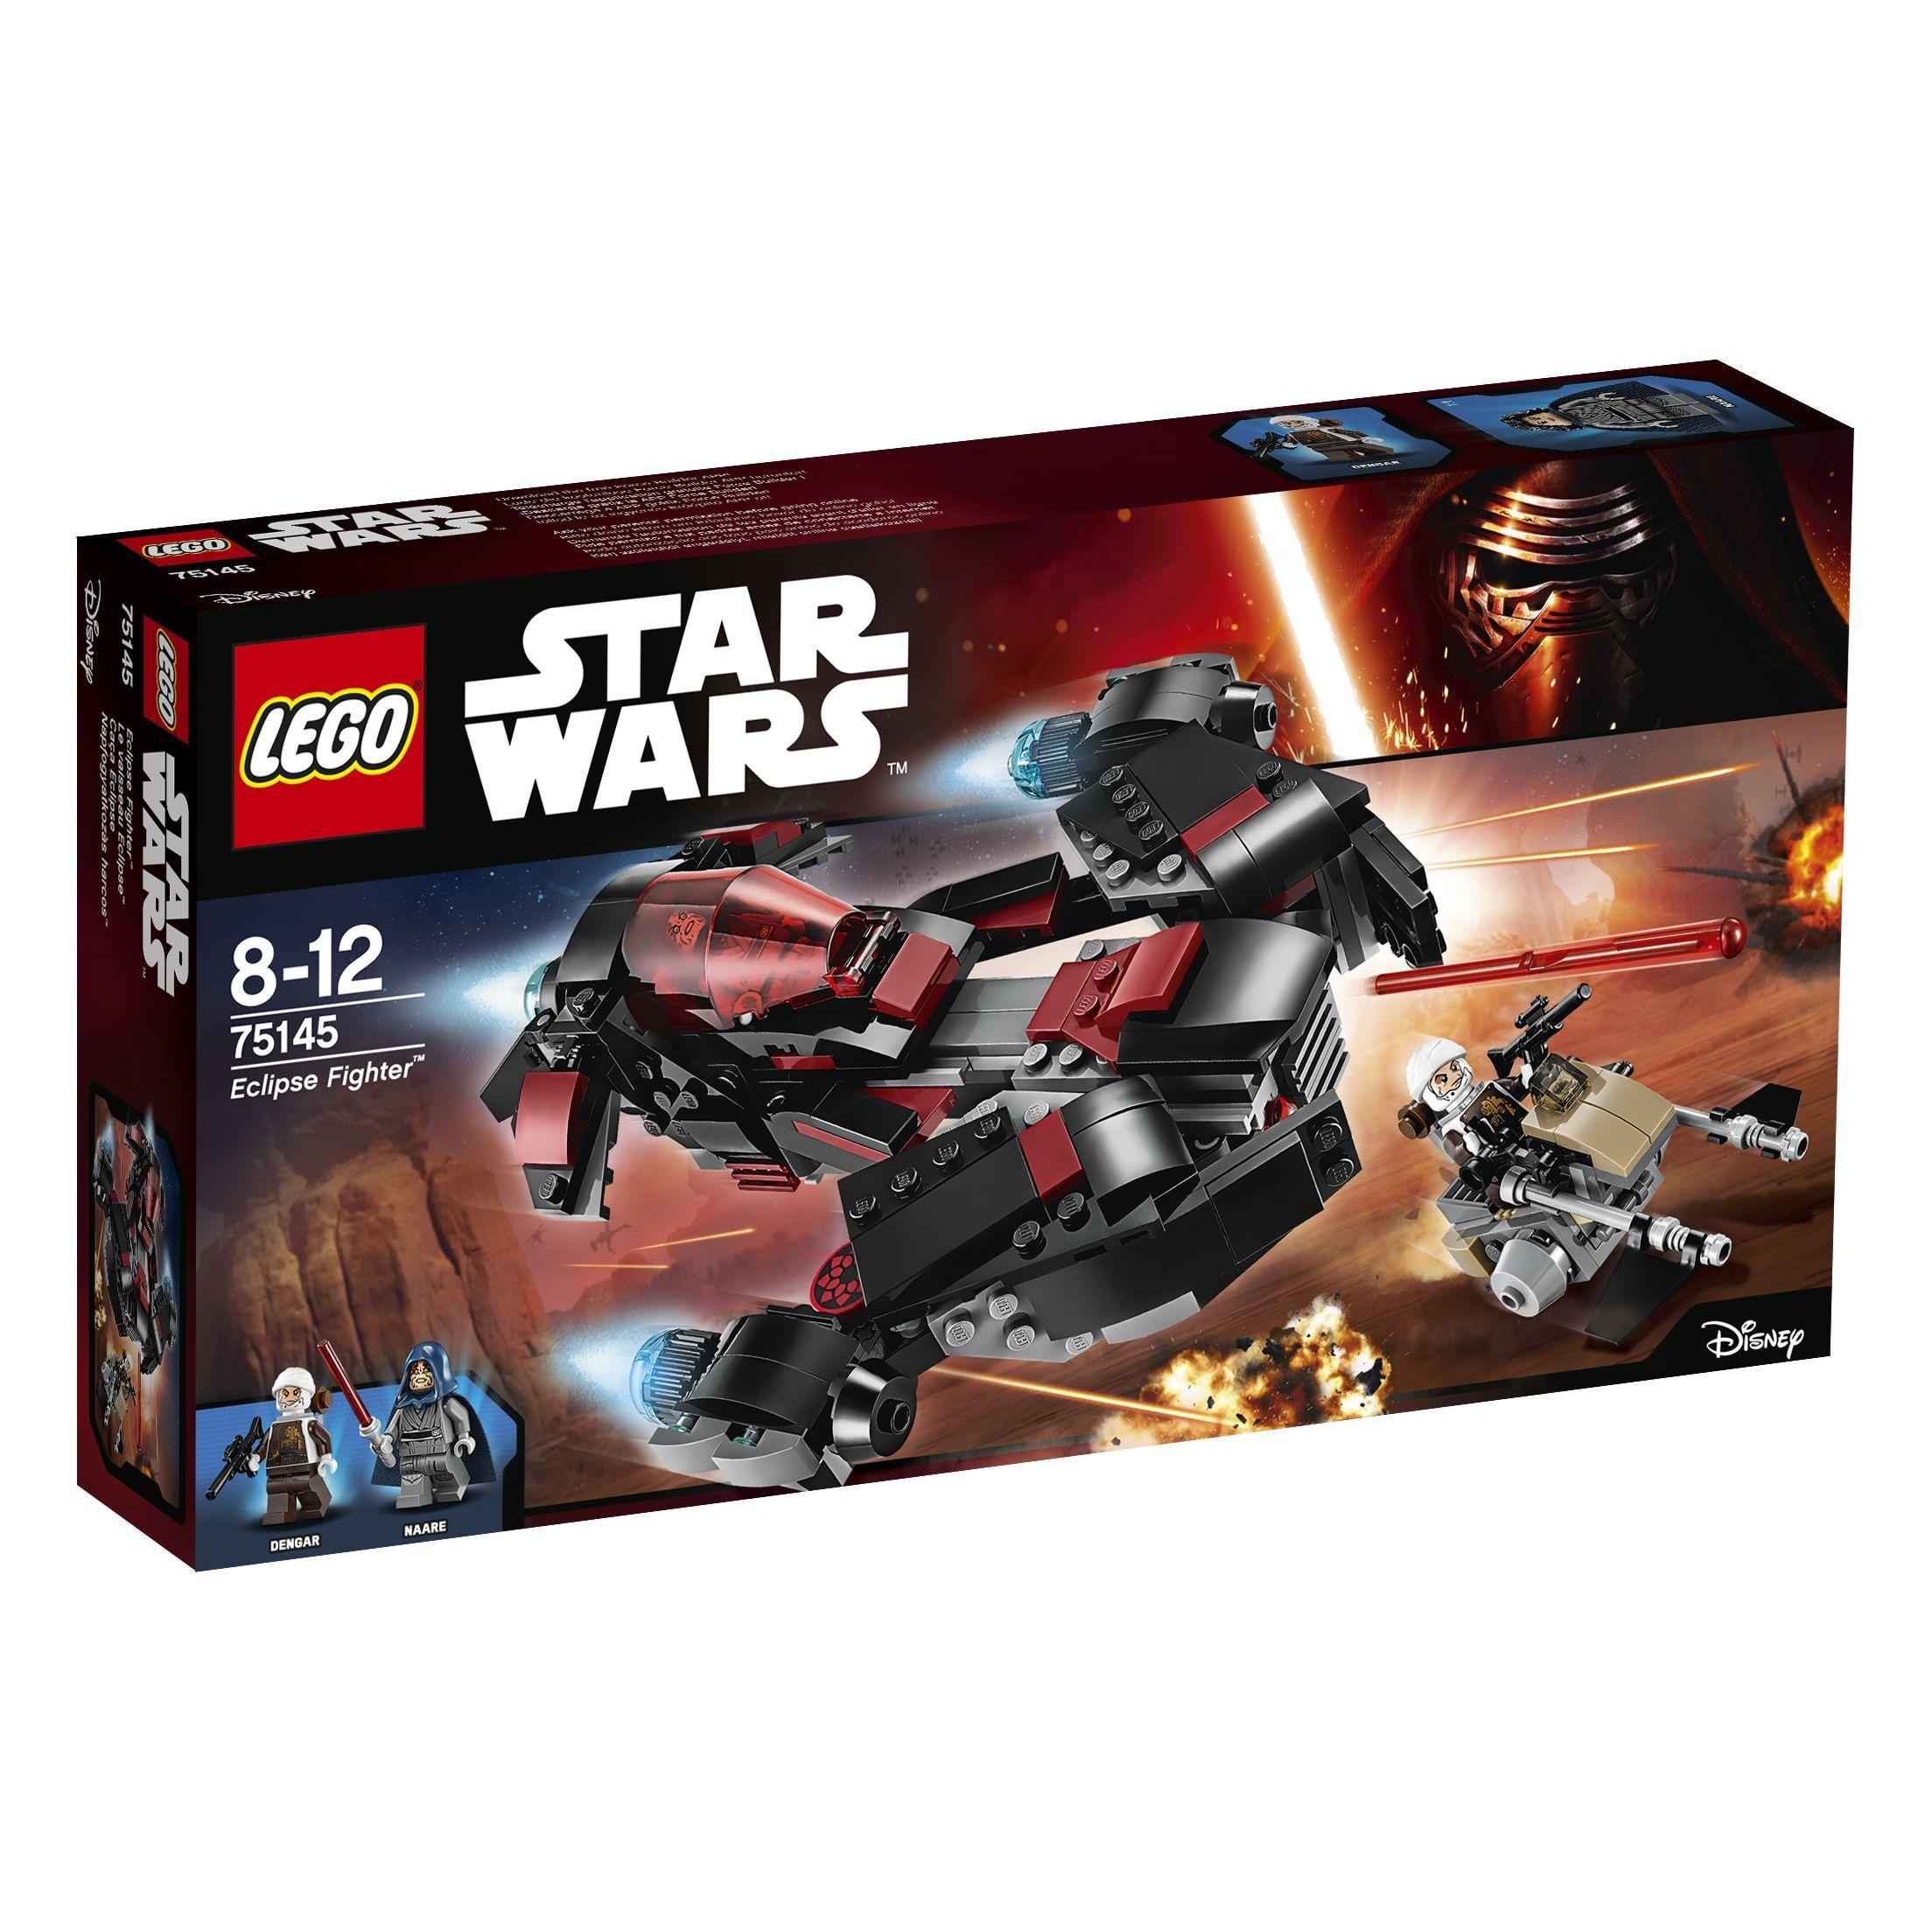 Lego Star Wars 2018 Ledlites Leia, Executioneer Trooper, Tie Pilot,